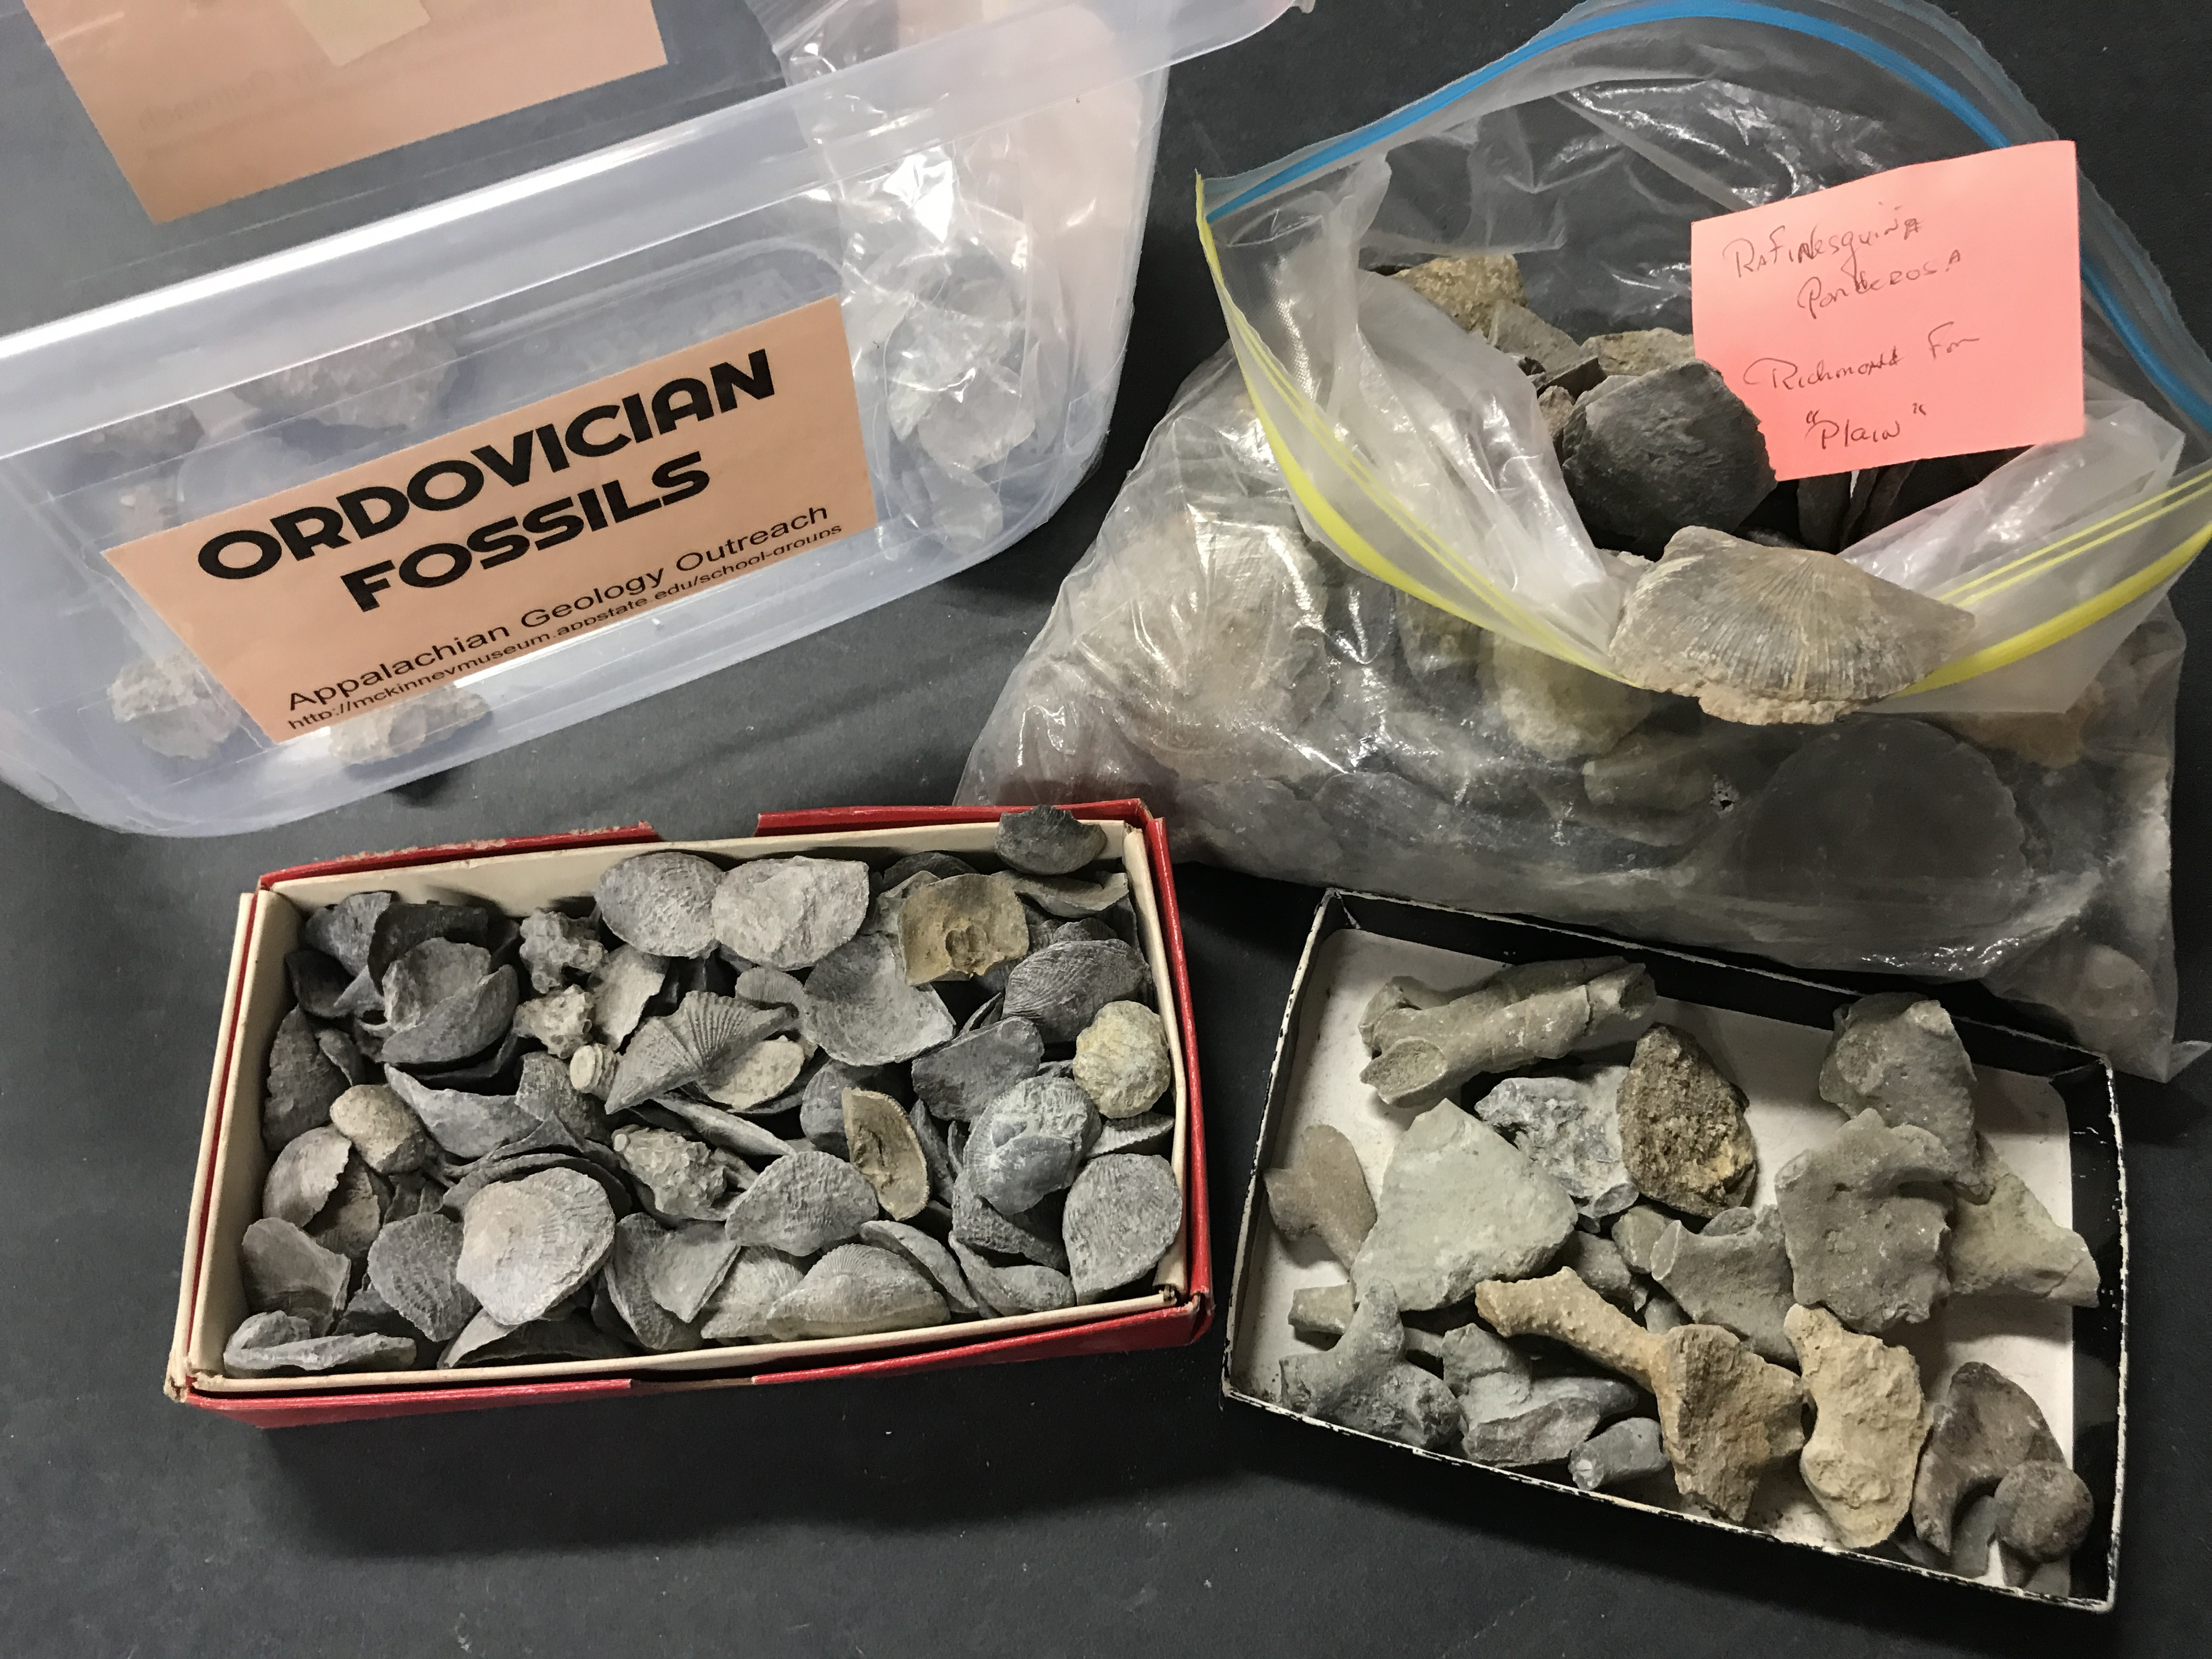 Ordovician Fossil Samples